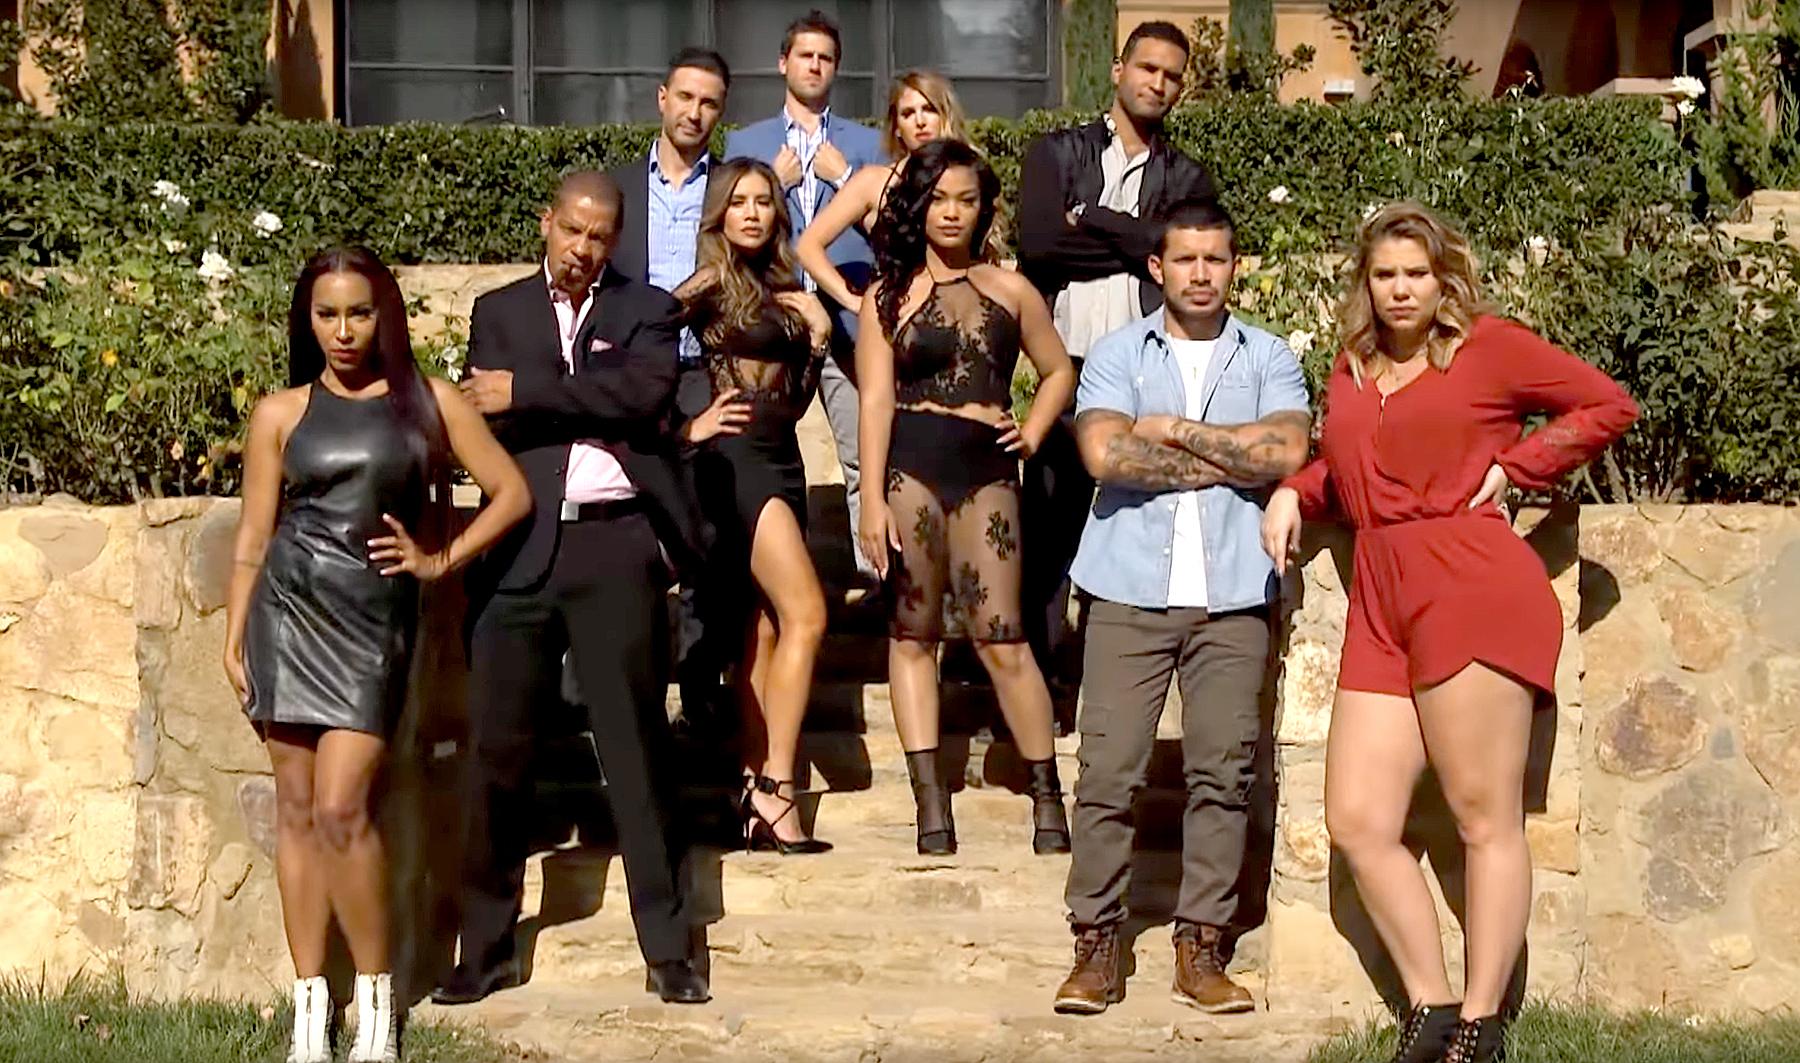 Celebrity marriage boot camp season 5 recap